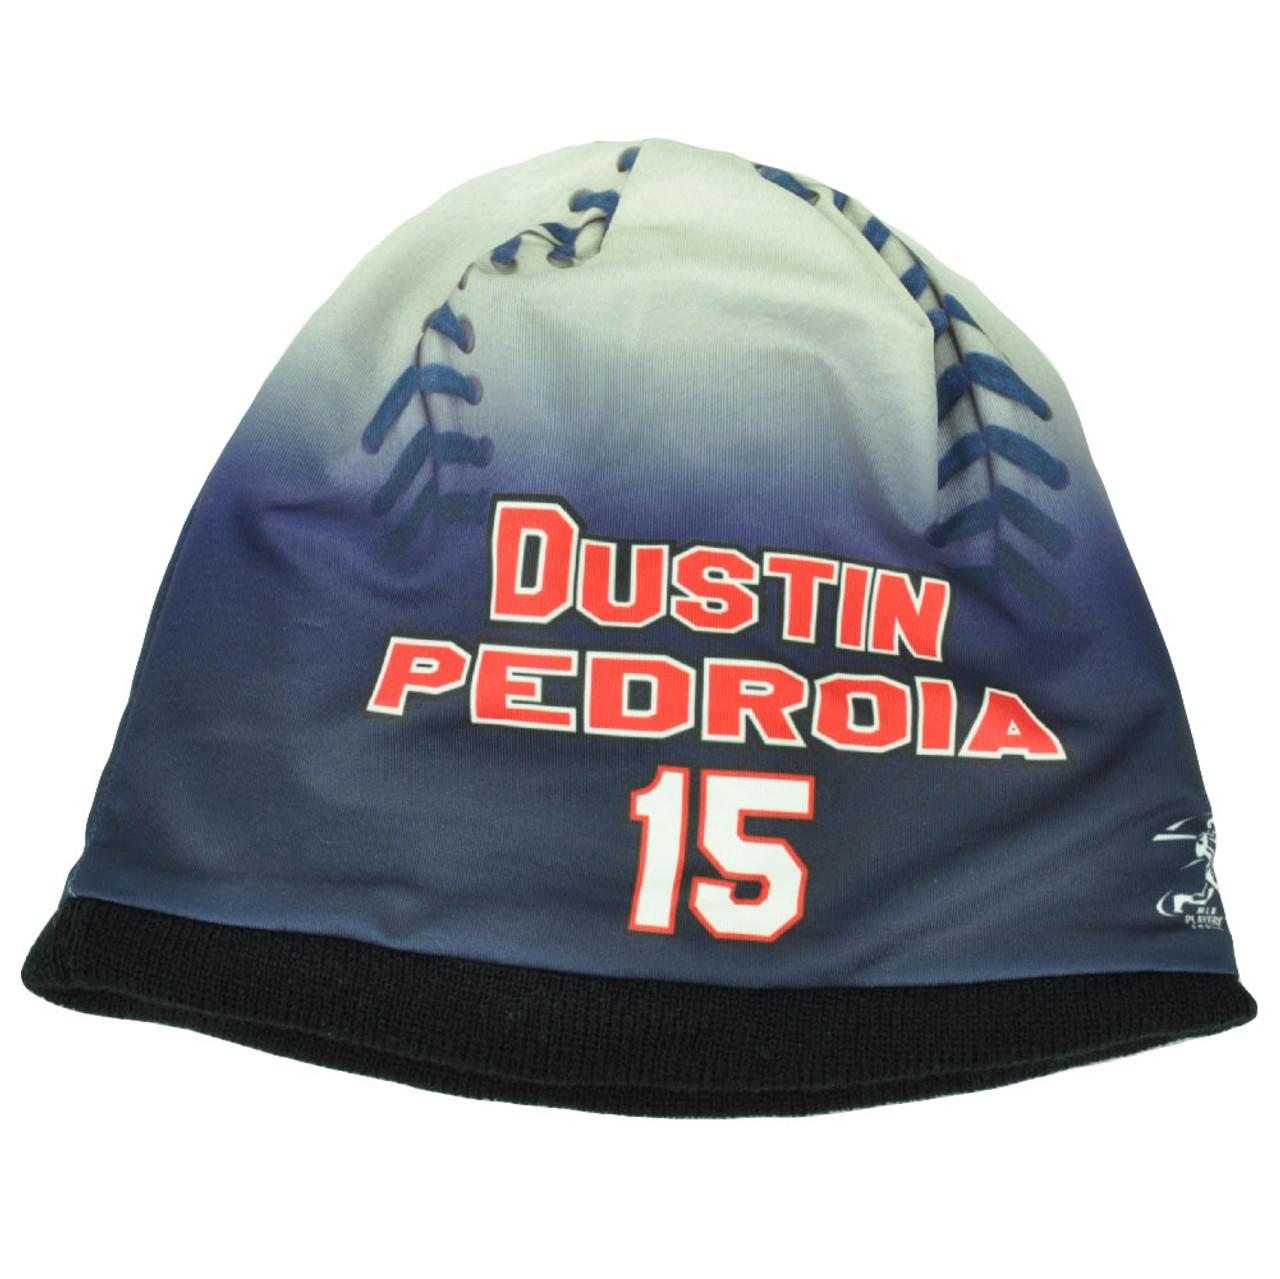 f7370cd45829f4 Boston Red Sox Mens Baseball Knit Beanie Cuffless Blue White Dustin Pedroia  15 - Cap Store Online.com